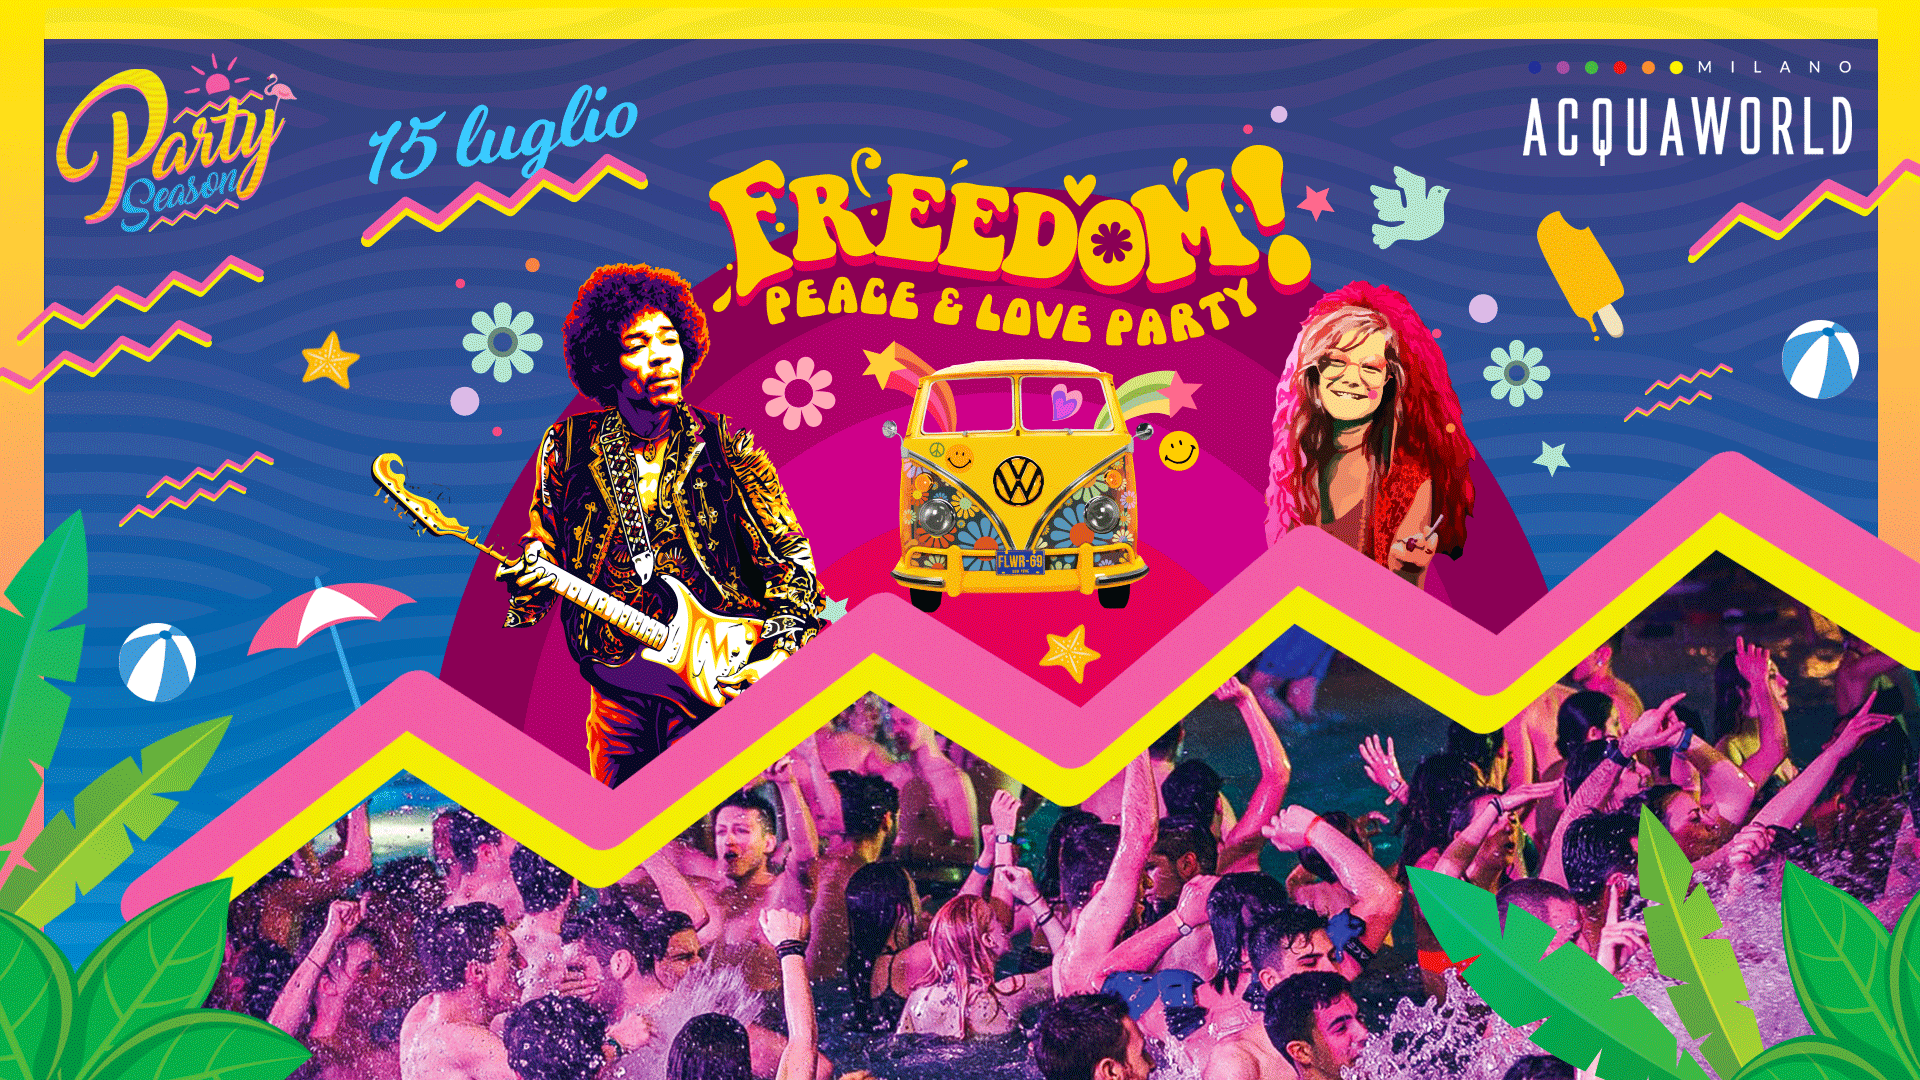 Freedom ad Acquaworld